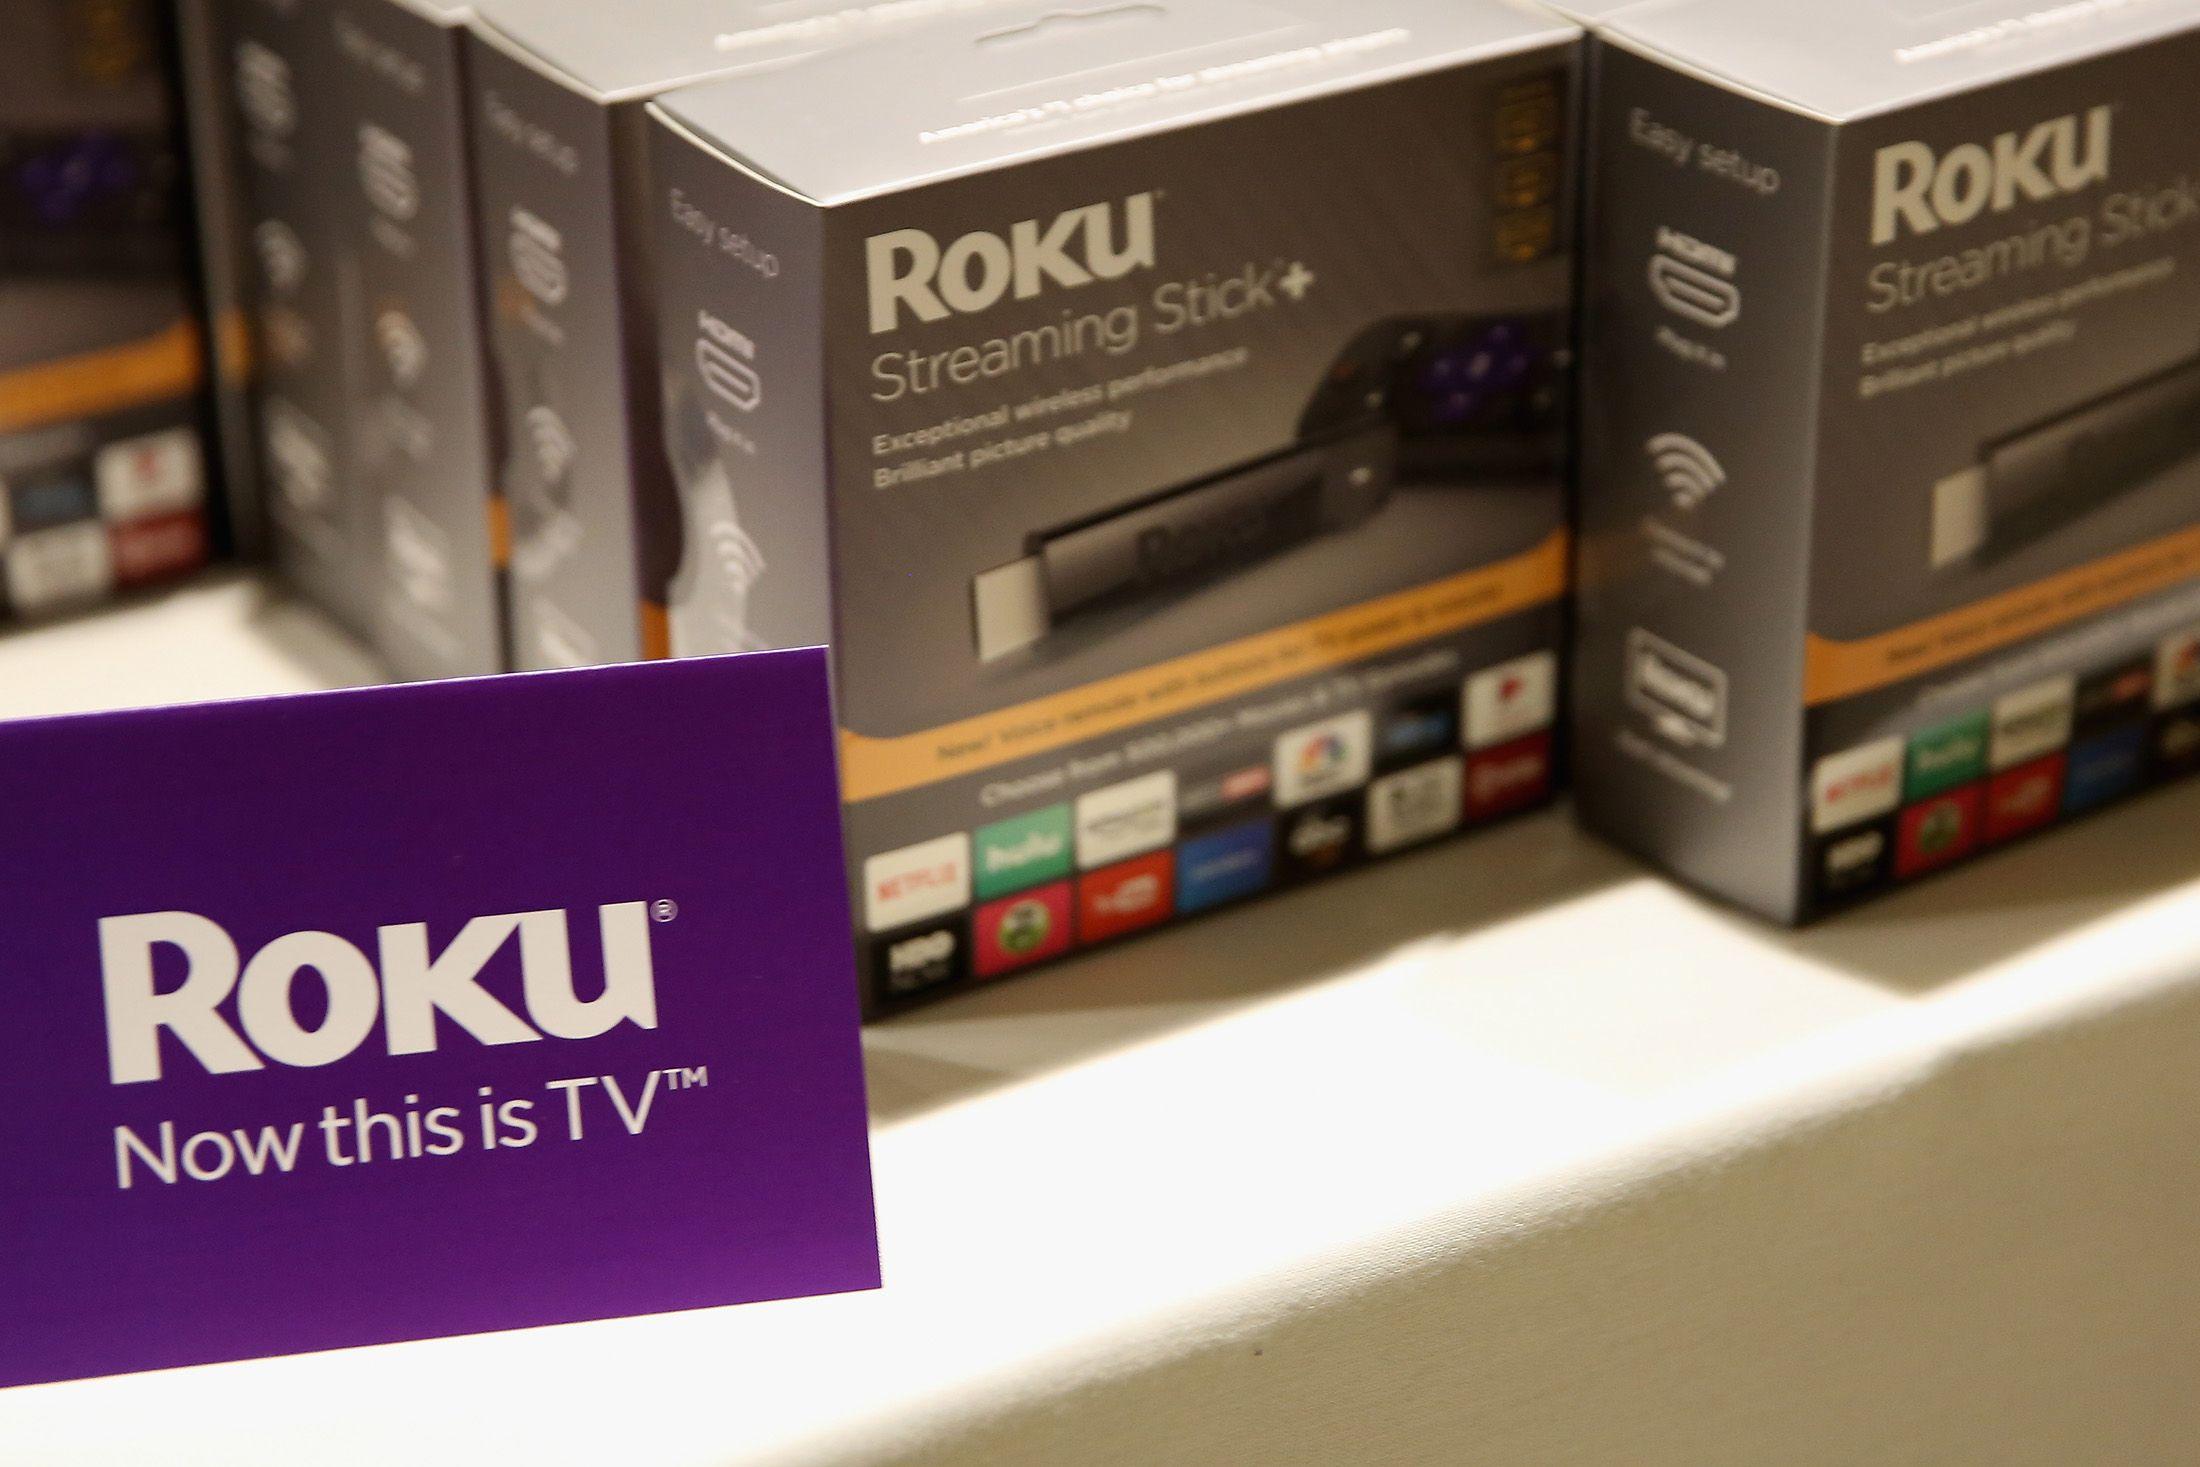 Roku says YouTube TV may go dark on its platform in dispute